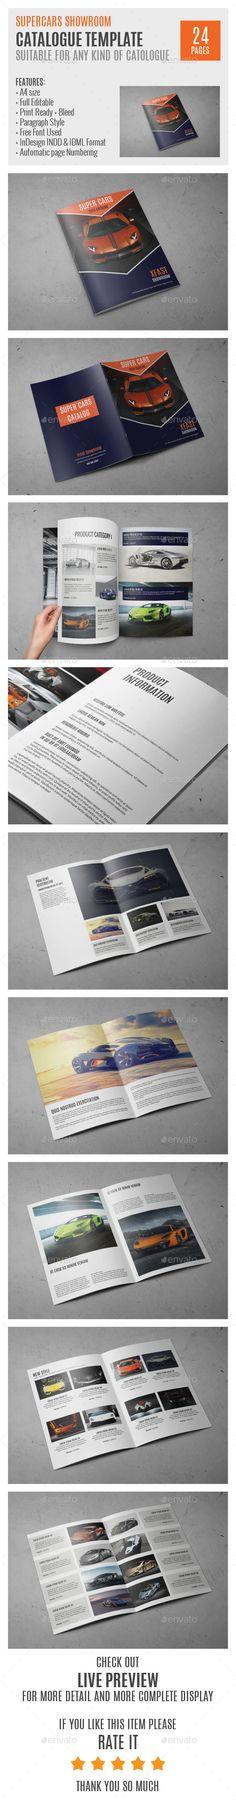 SuperCars A4 Catalog Template 0003